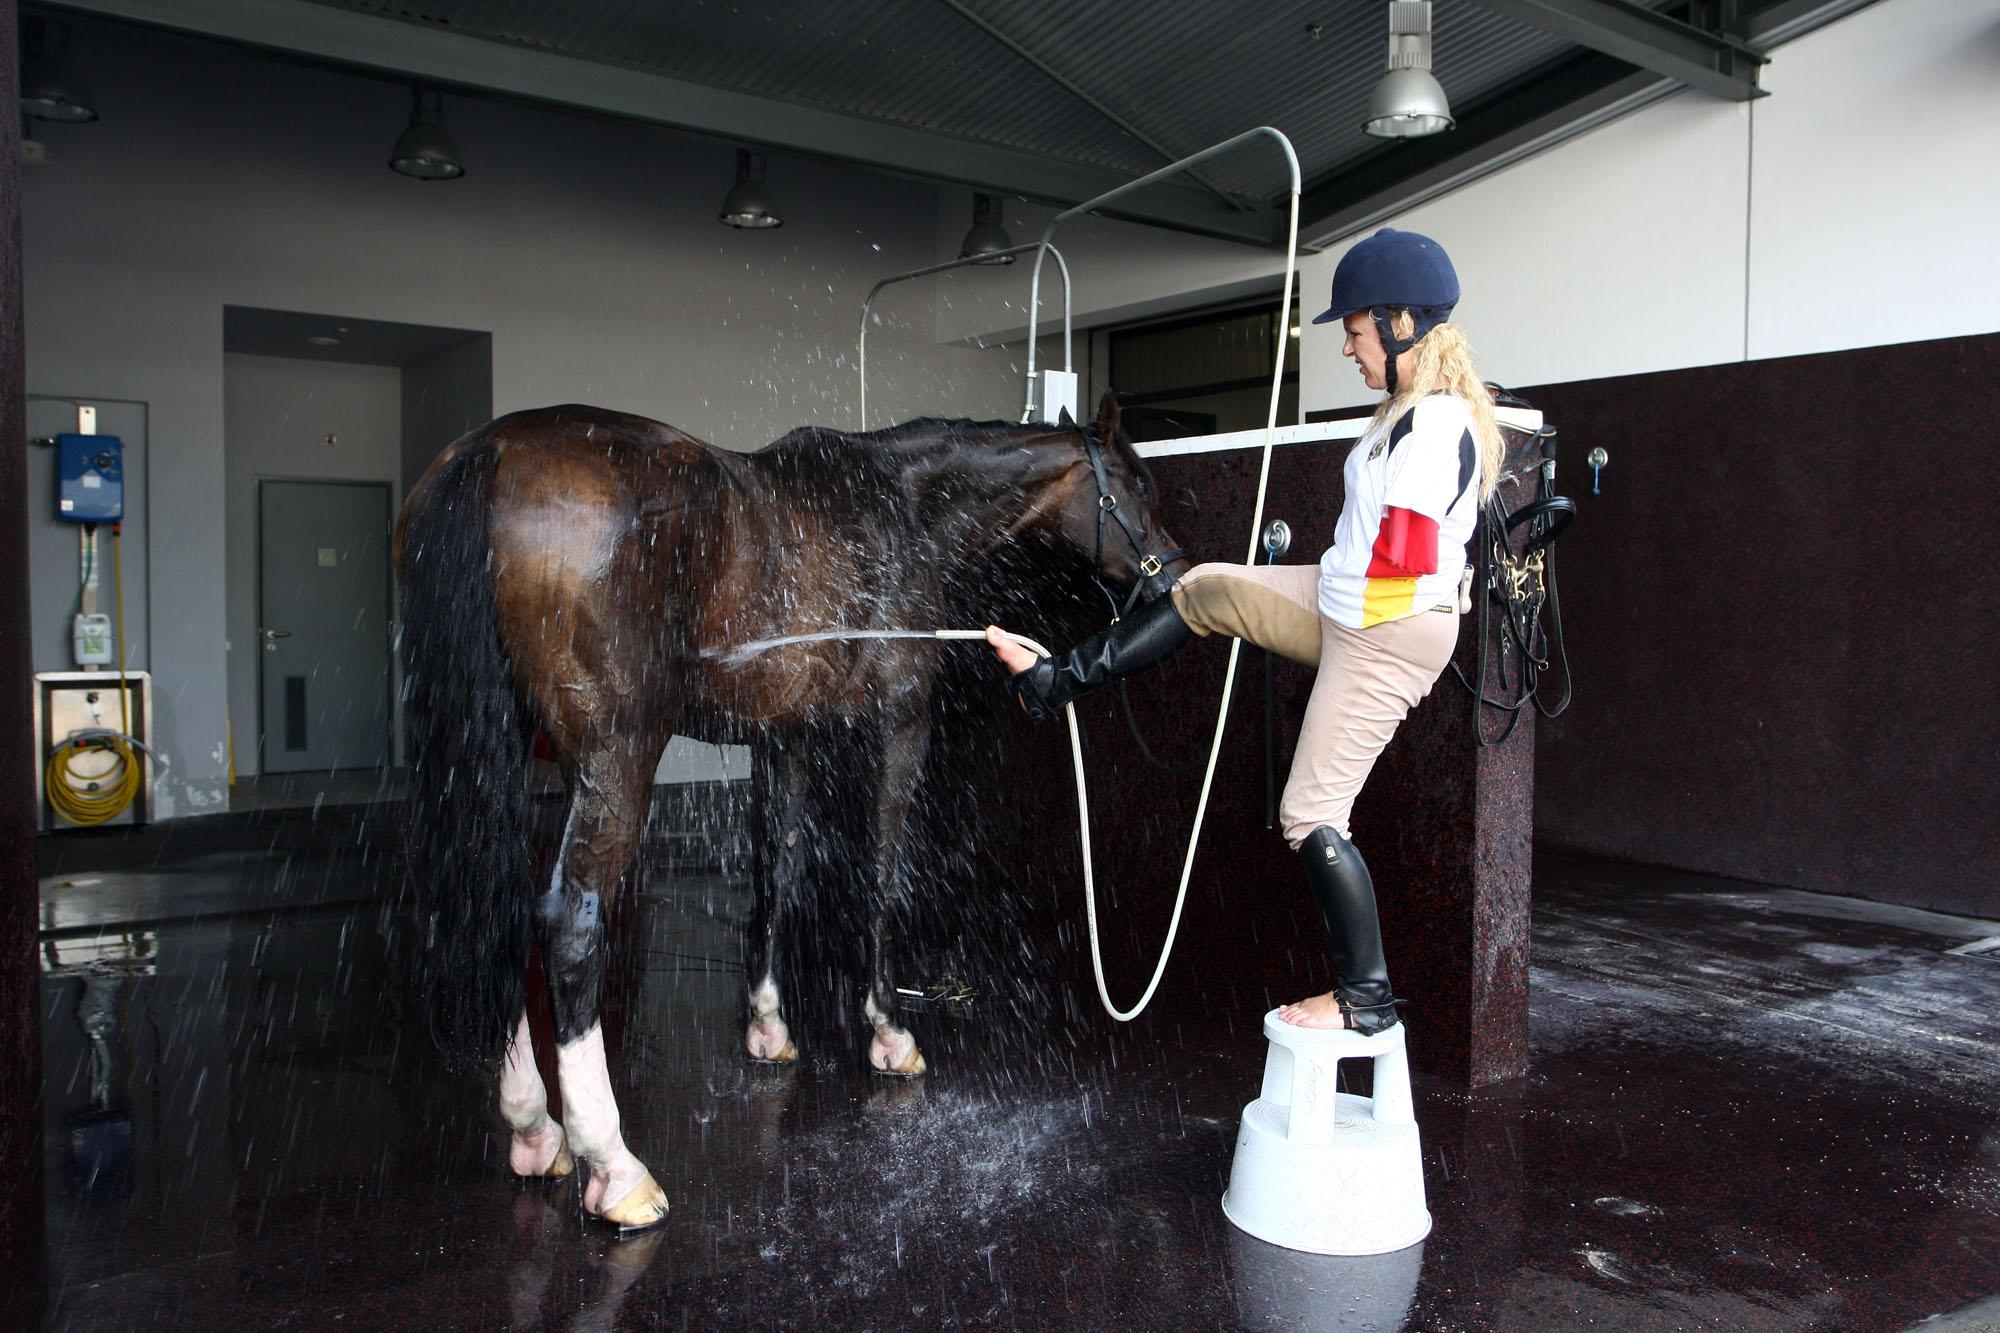 http://horseandman.com/wp-content/uploads/hosing.jpg